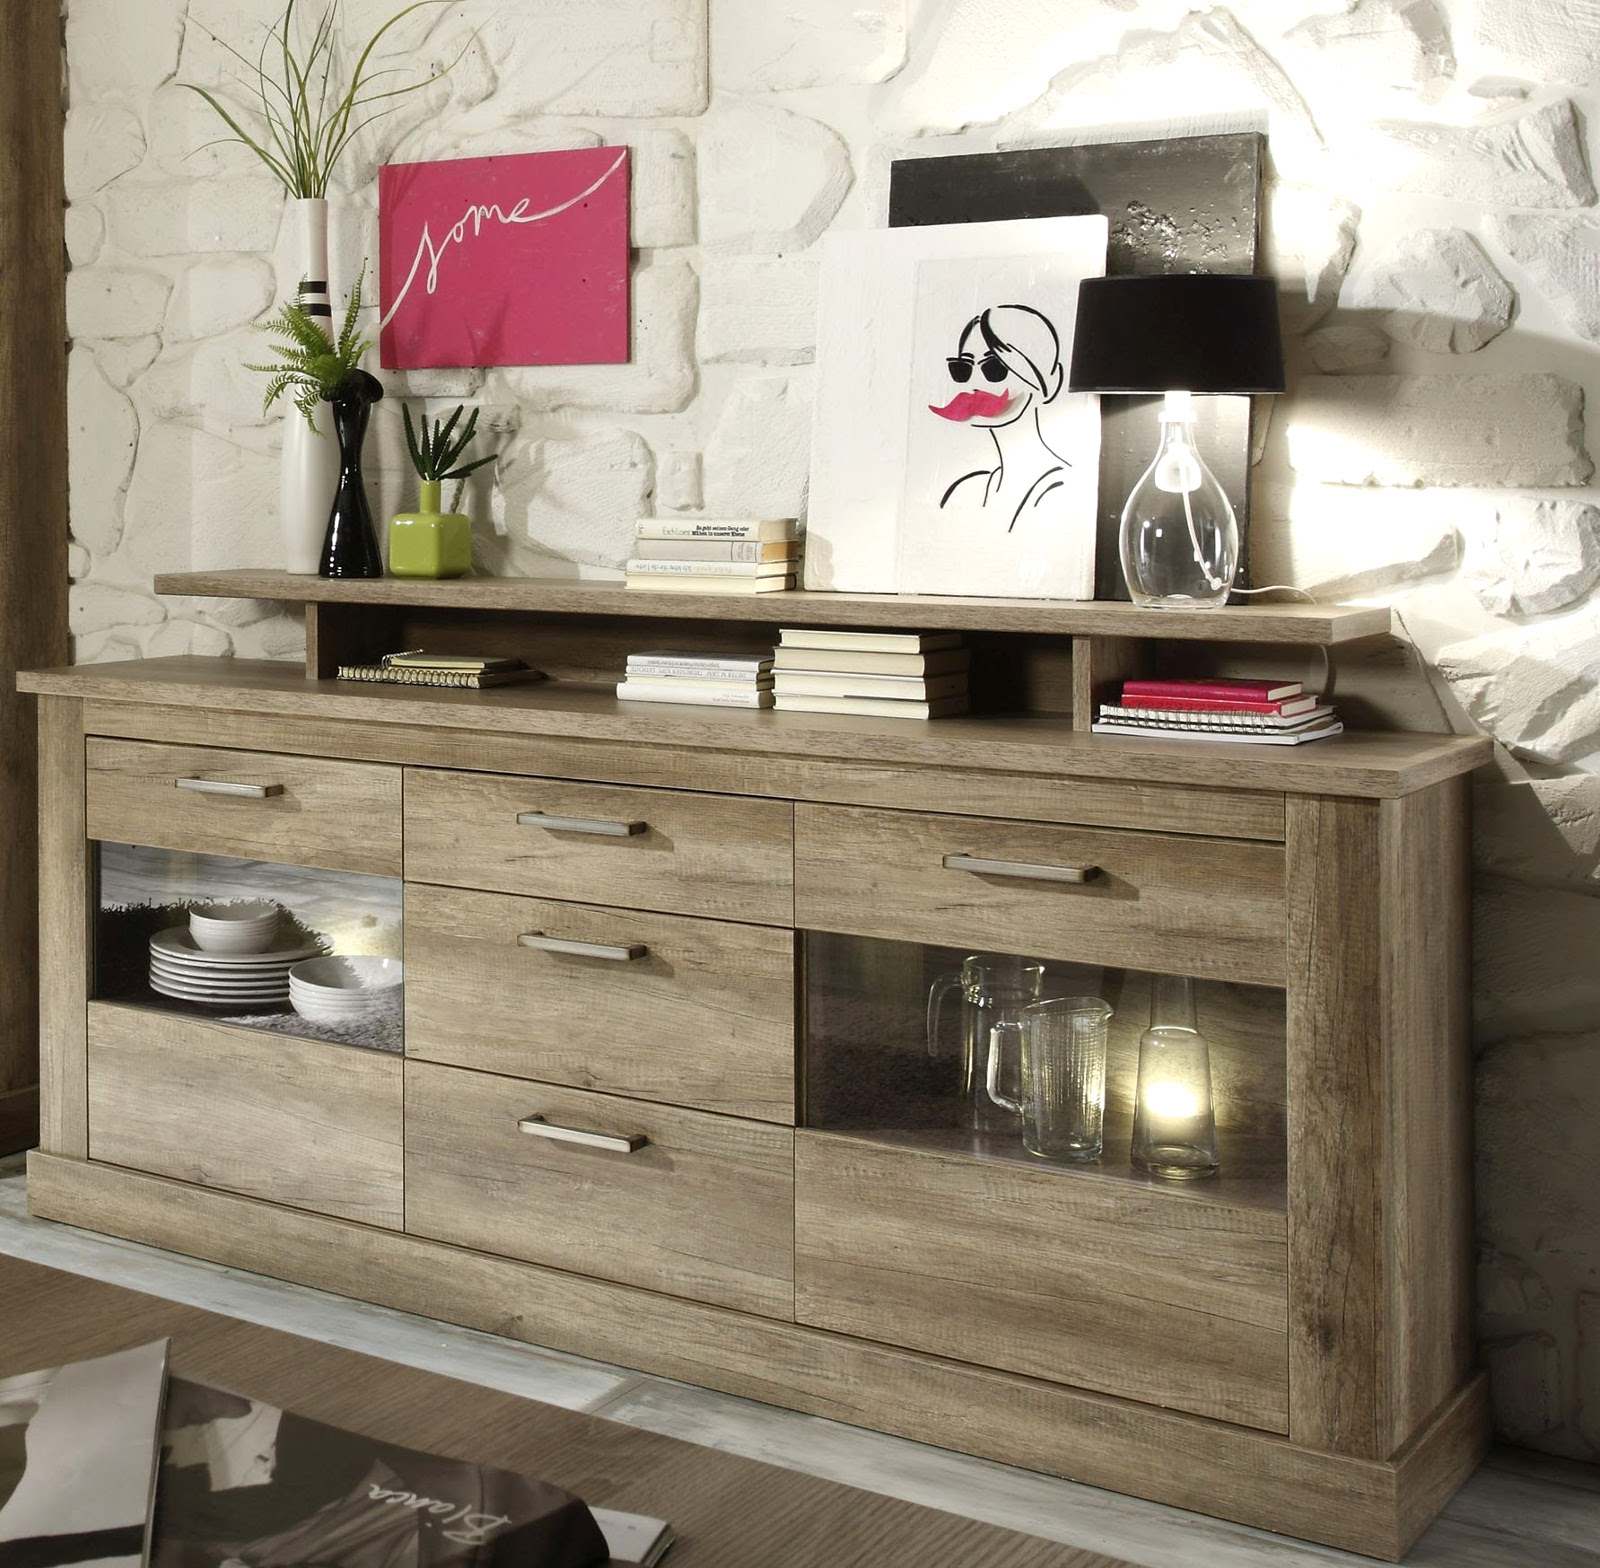 wohnwand b cherregal bibliothek schrankwand lack weiss. Black Bedroom Furniture Sets. Home Design Ideas